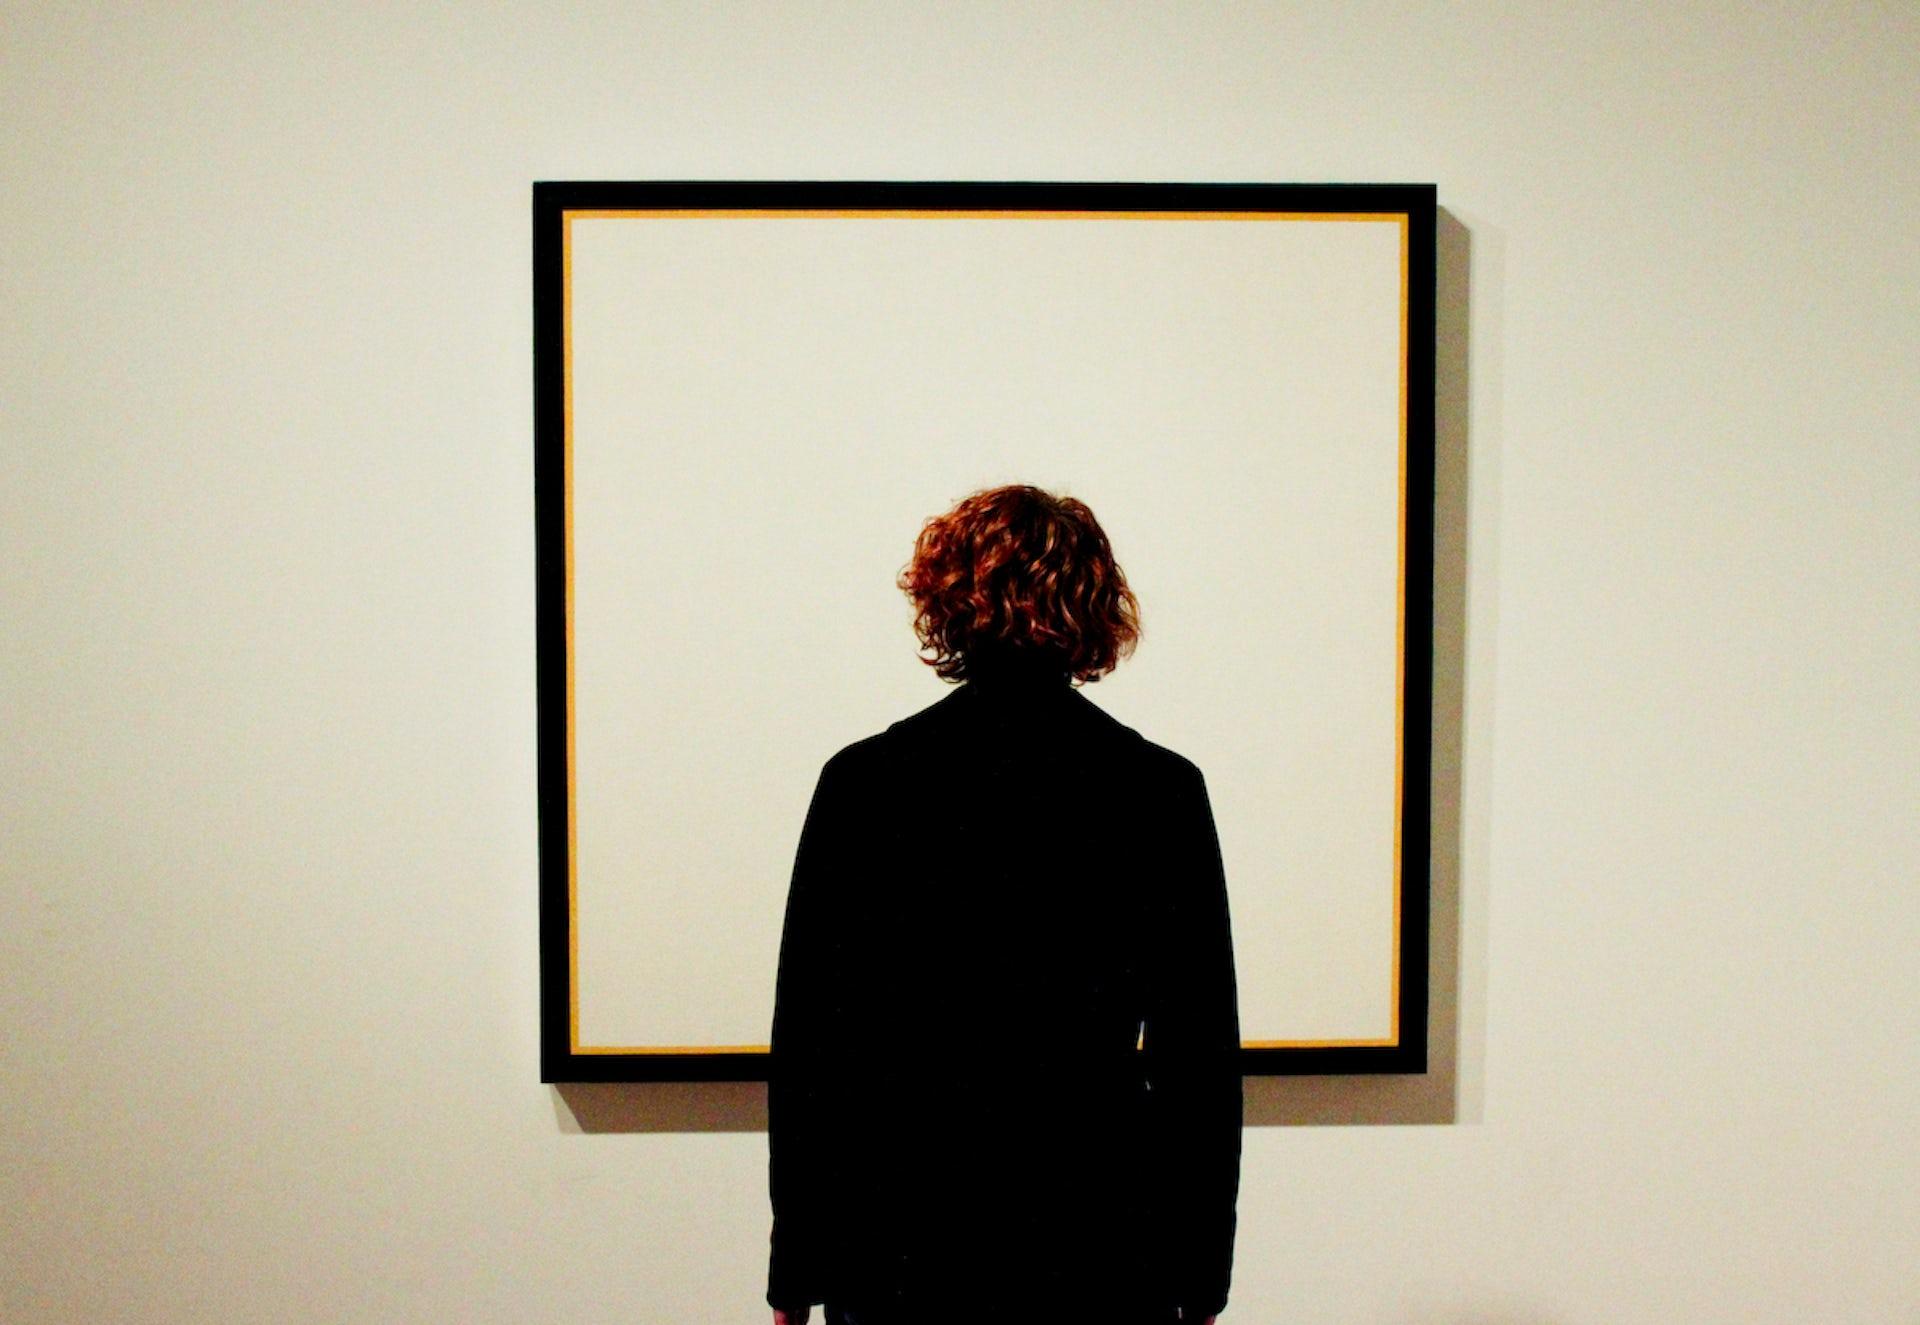 An art critic is ... Science art history. Profession art critic